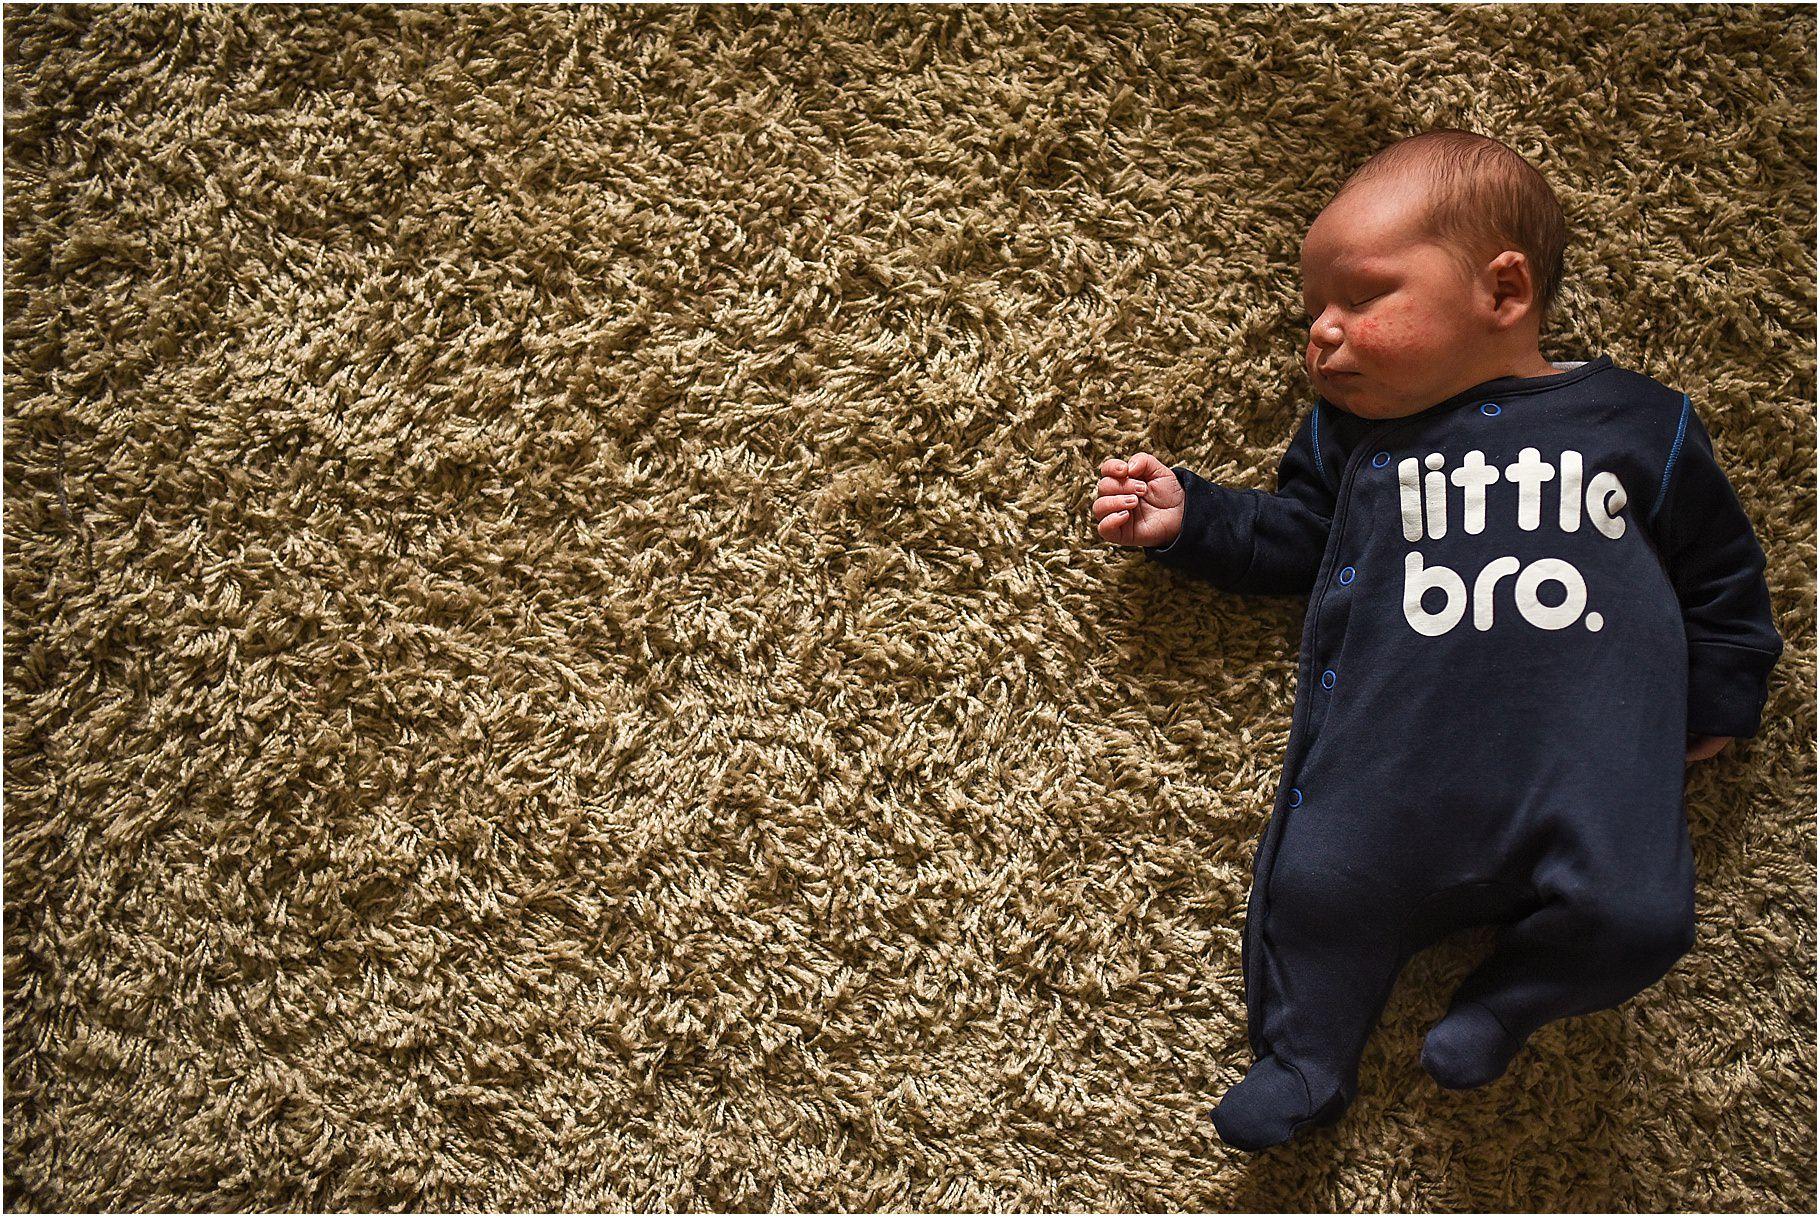 lancashire-family-portraits-documentary-newborn-39.jpg